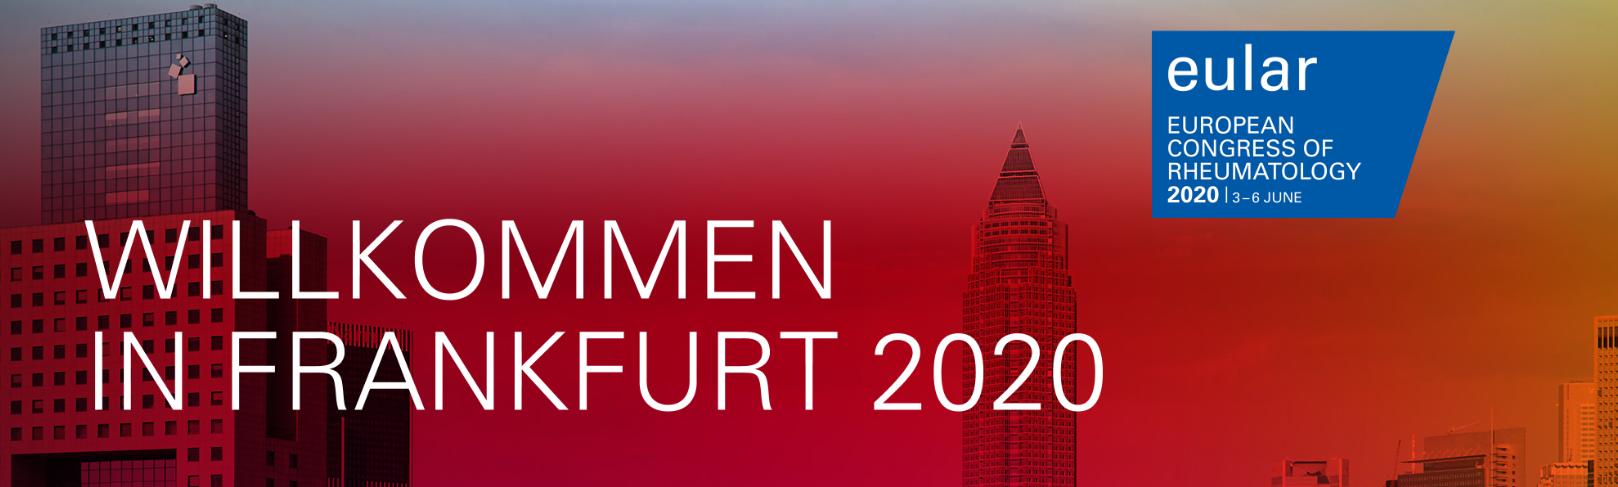 (Virtual) Annual European Congress of Rheumatology  (EULAR 2020)